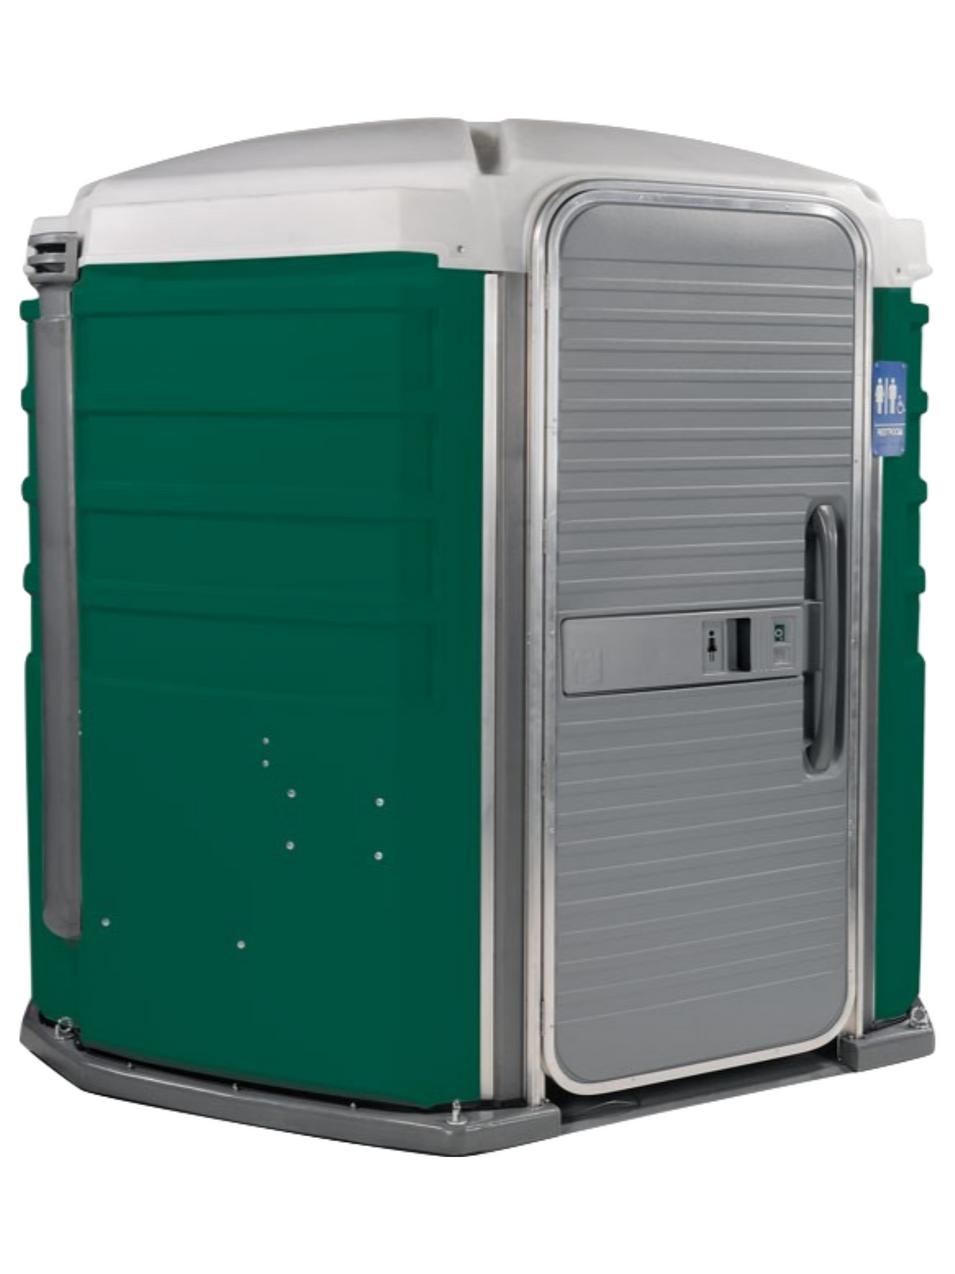 ADA Compliant handicap portable toilet for rent